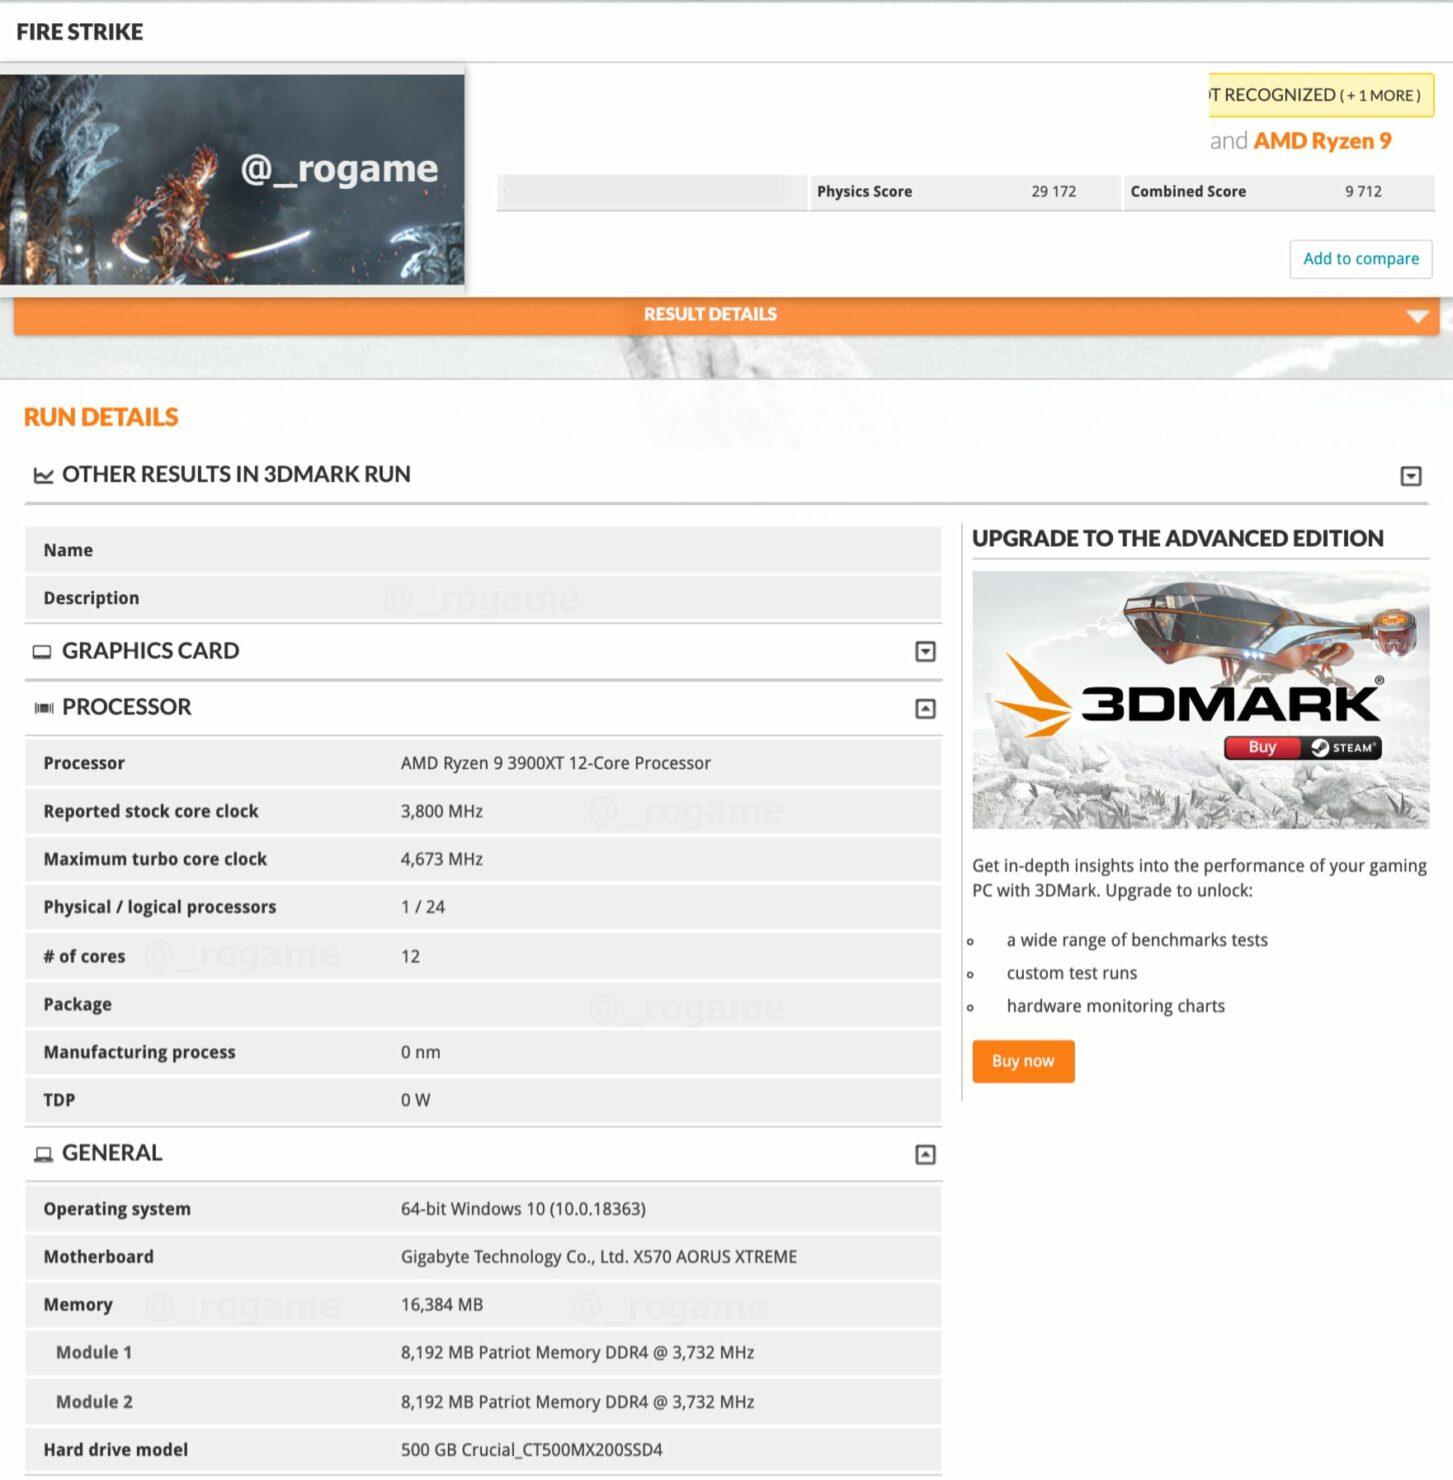 amd-ryzen-9-3900xt-12-core-cpu-3dmark-benchmark